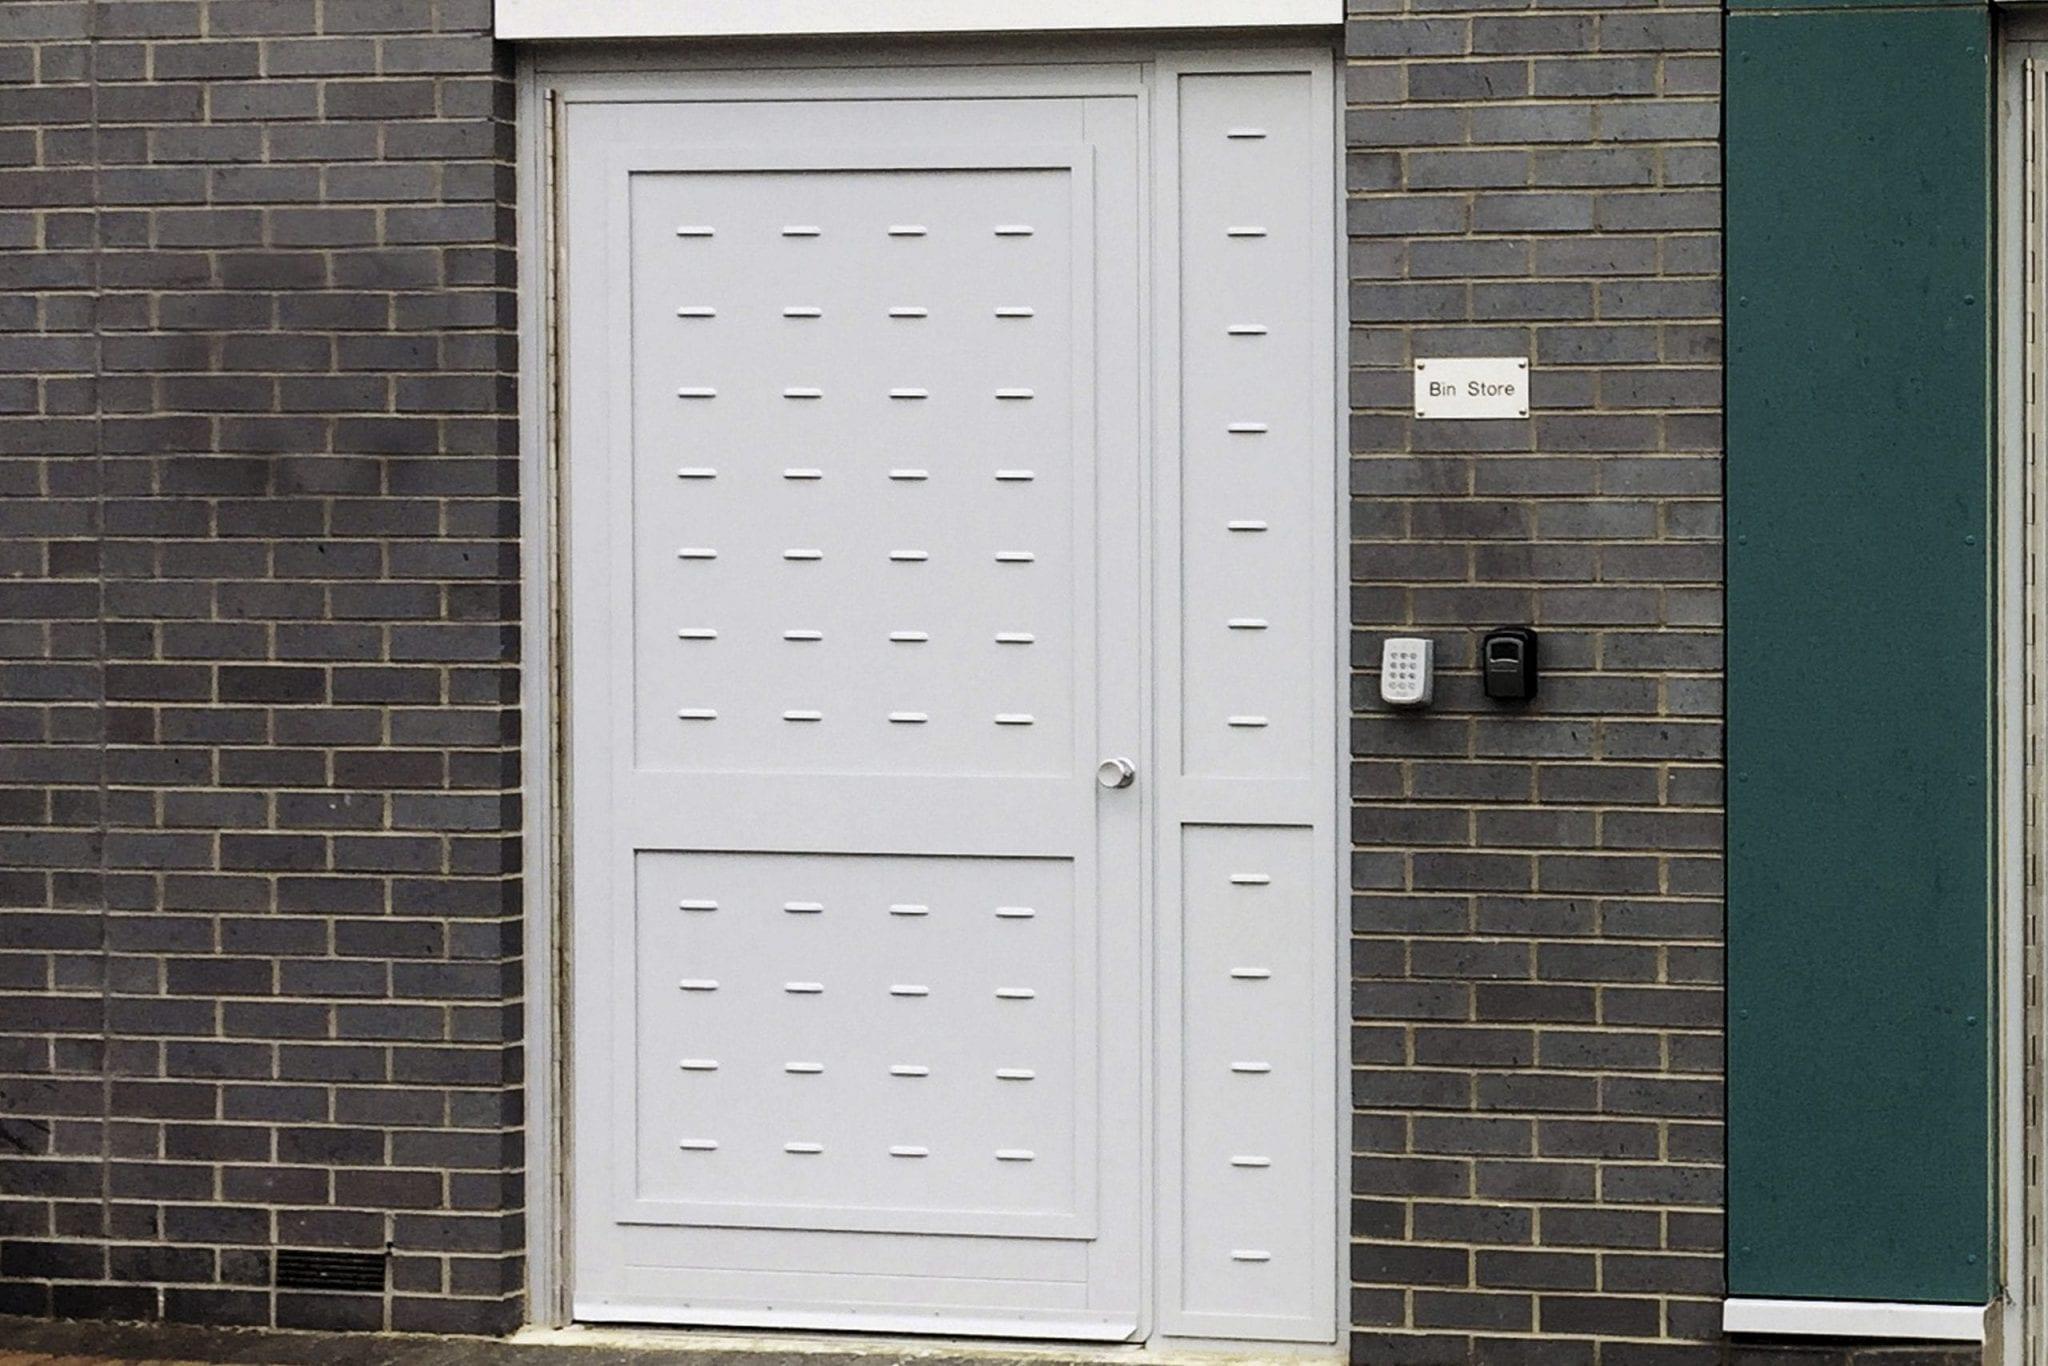 Warrior Bin Store Door on a Communal Residential Building.